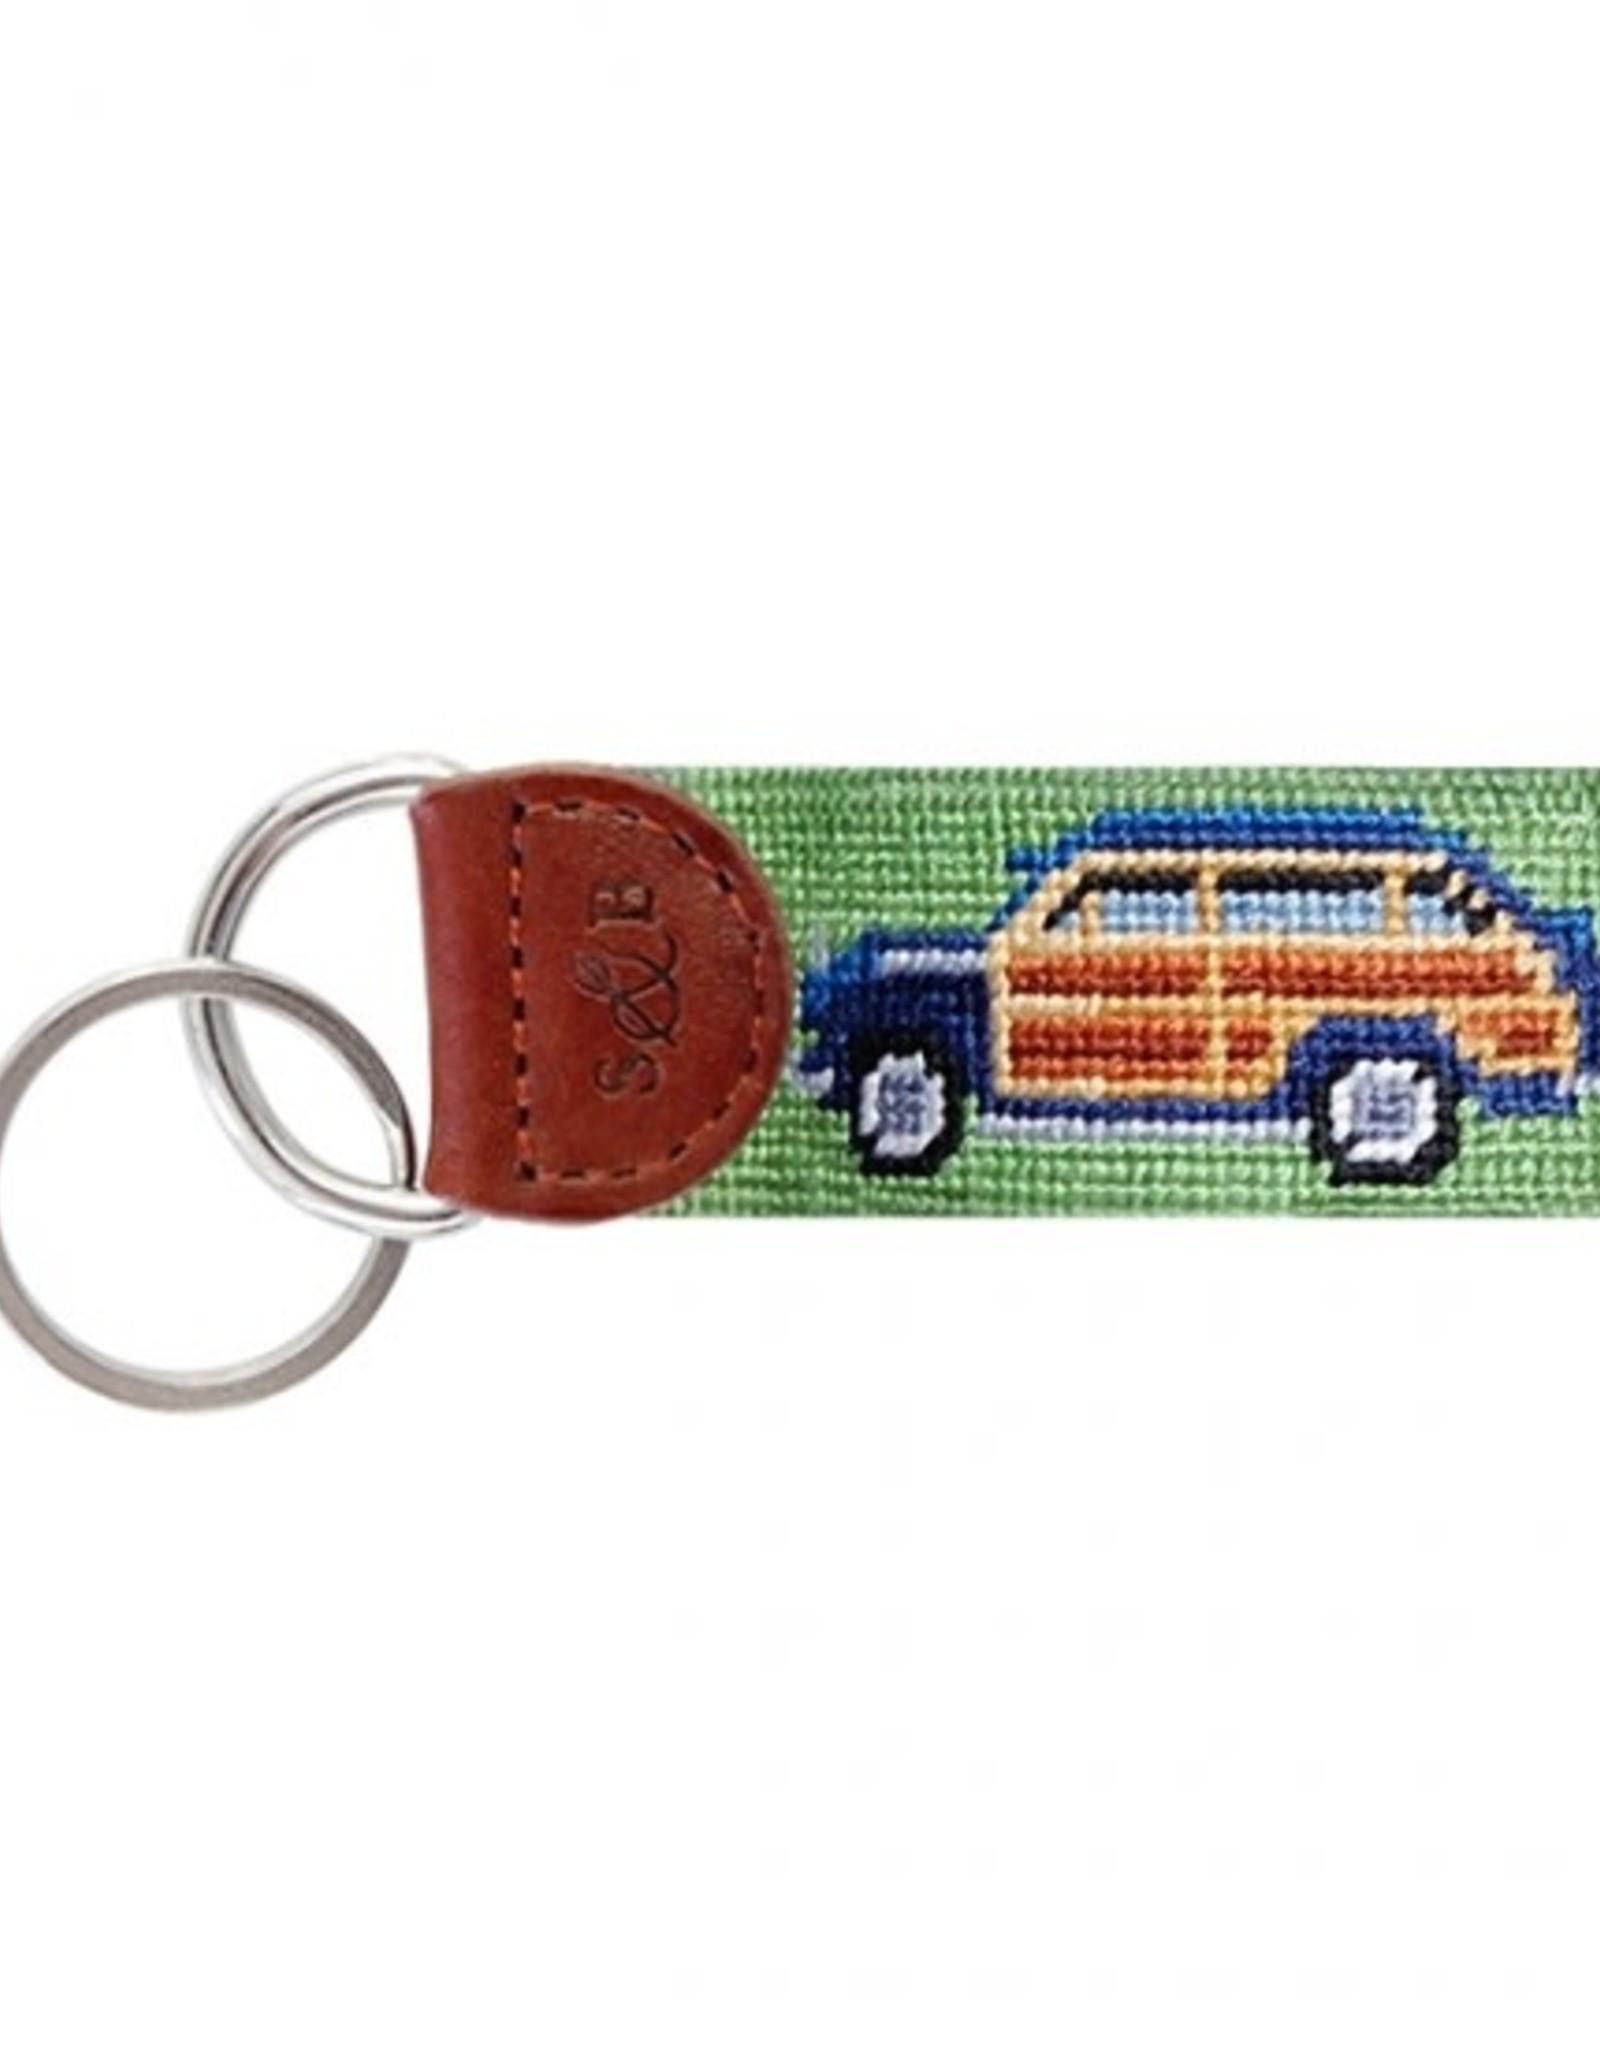 Smathers & Branson Woody Needlepoint Key Fob